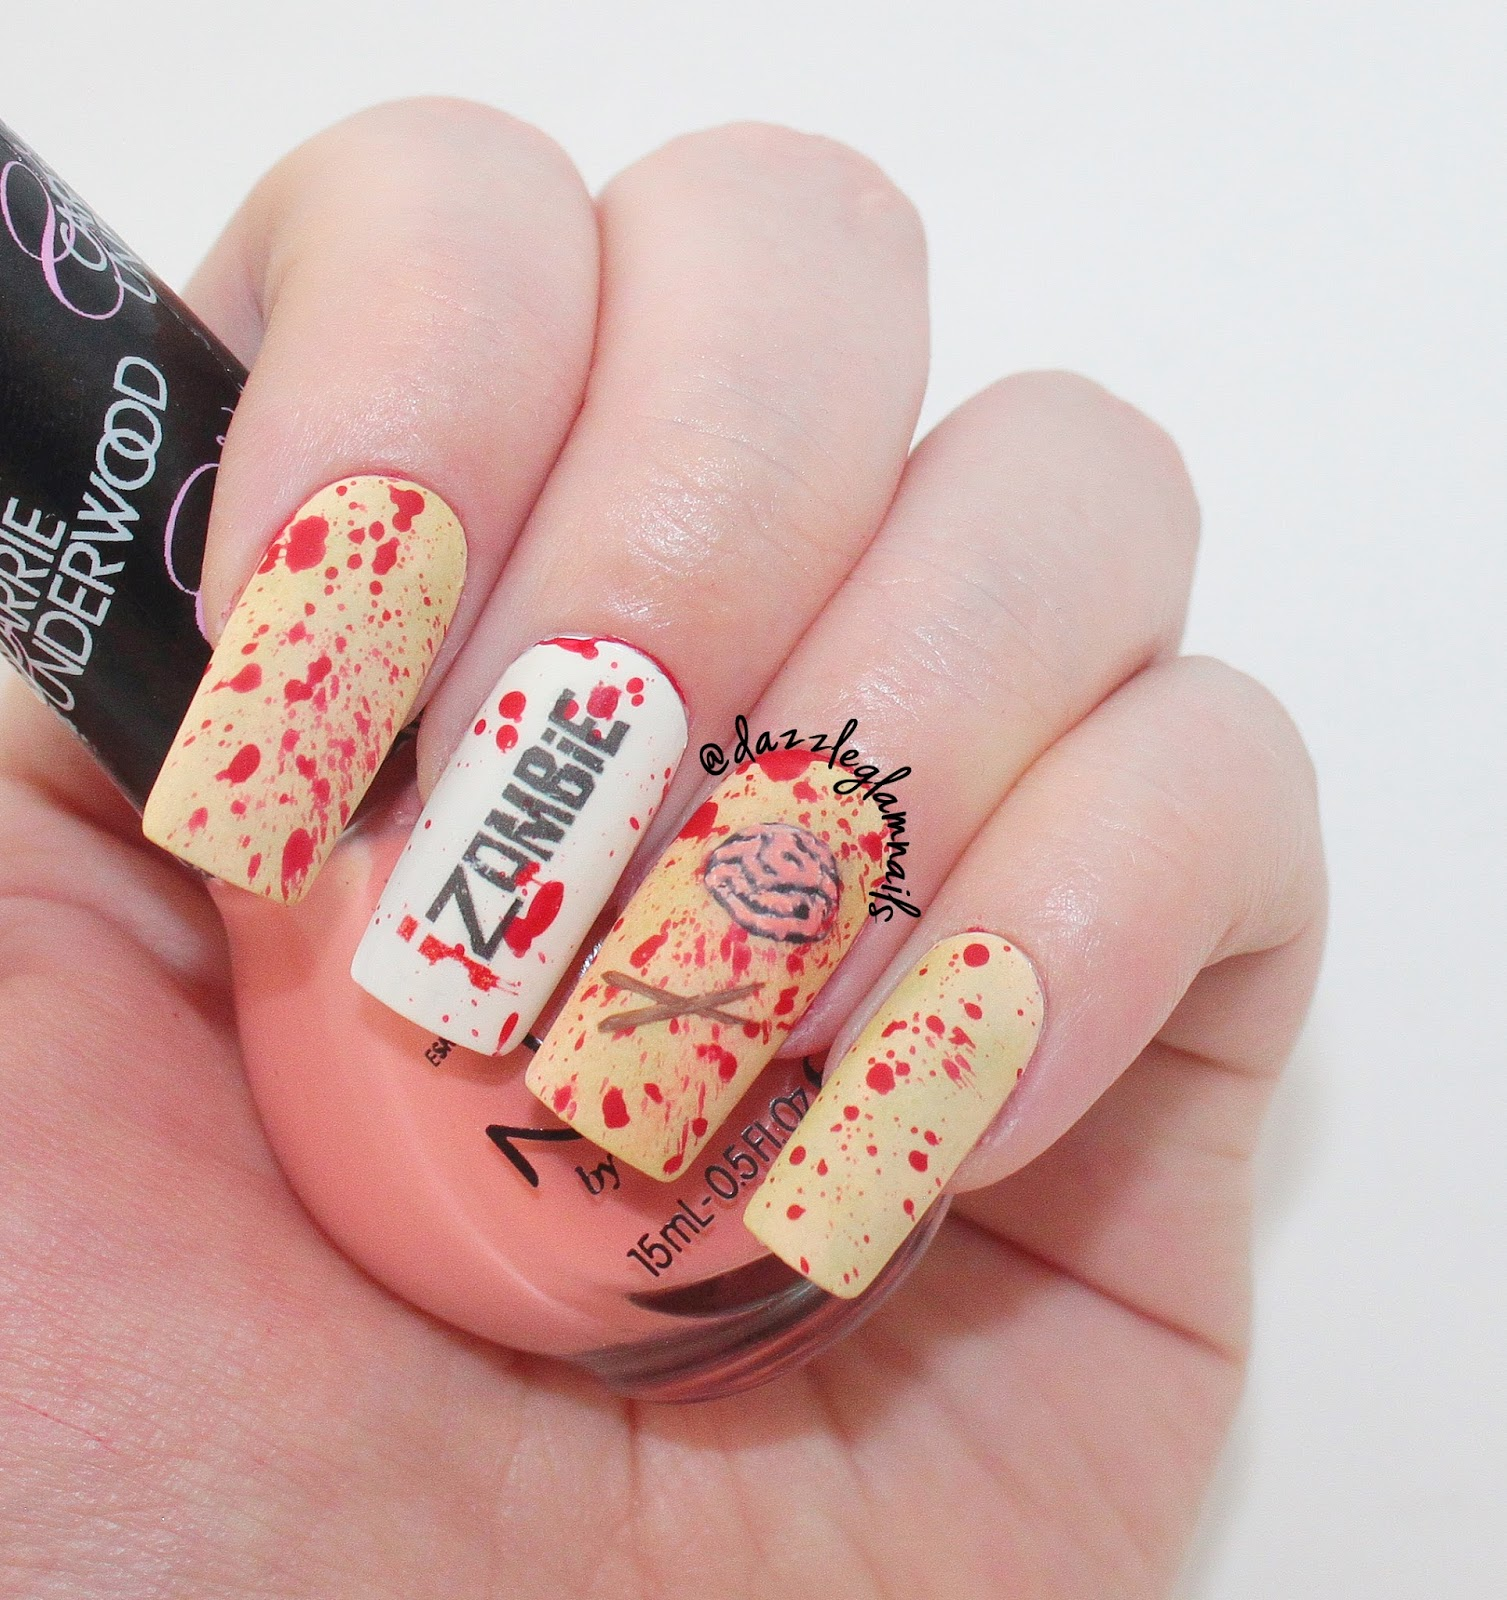 Dazzle Glam Nails   Nail Art Blog: iZombie Nails